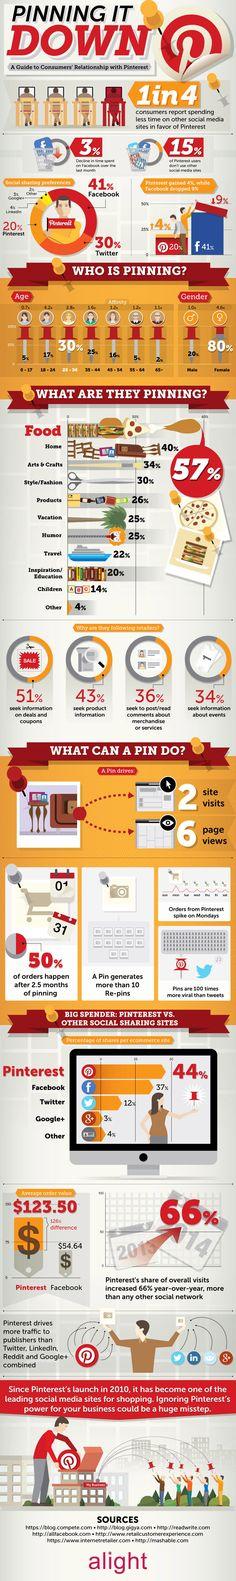 Pinning Down Pinterest User Demographics Infographic. Topic: social media.